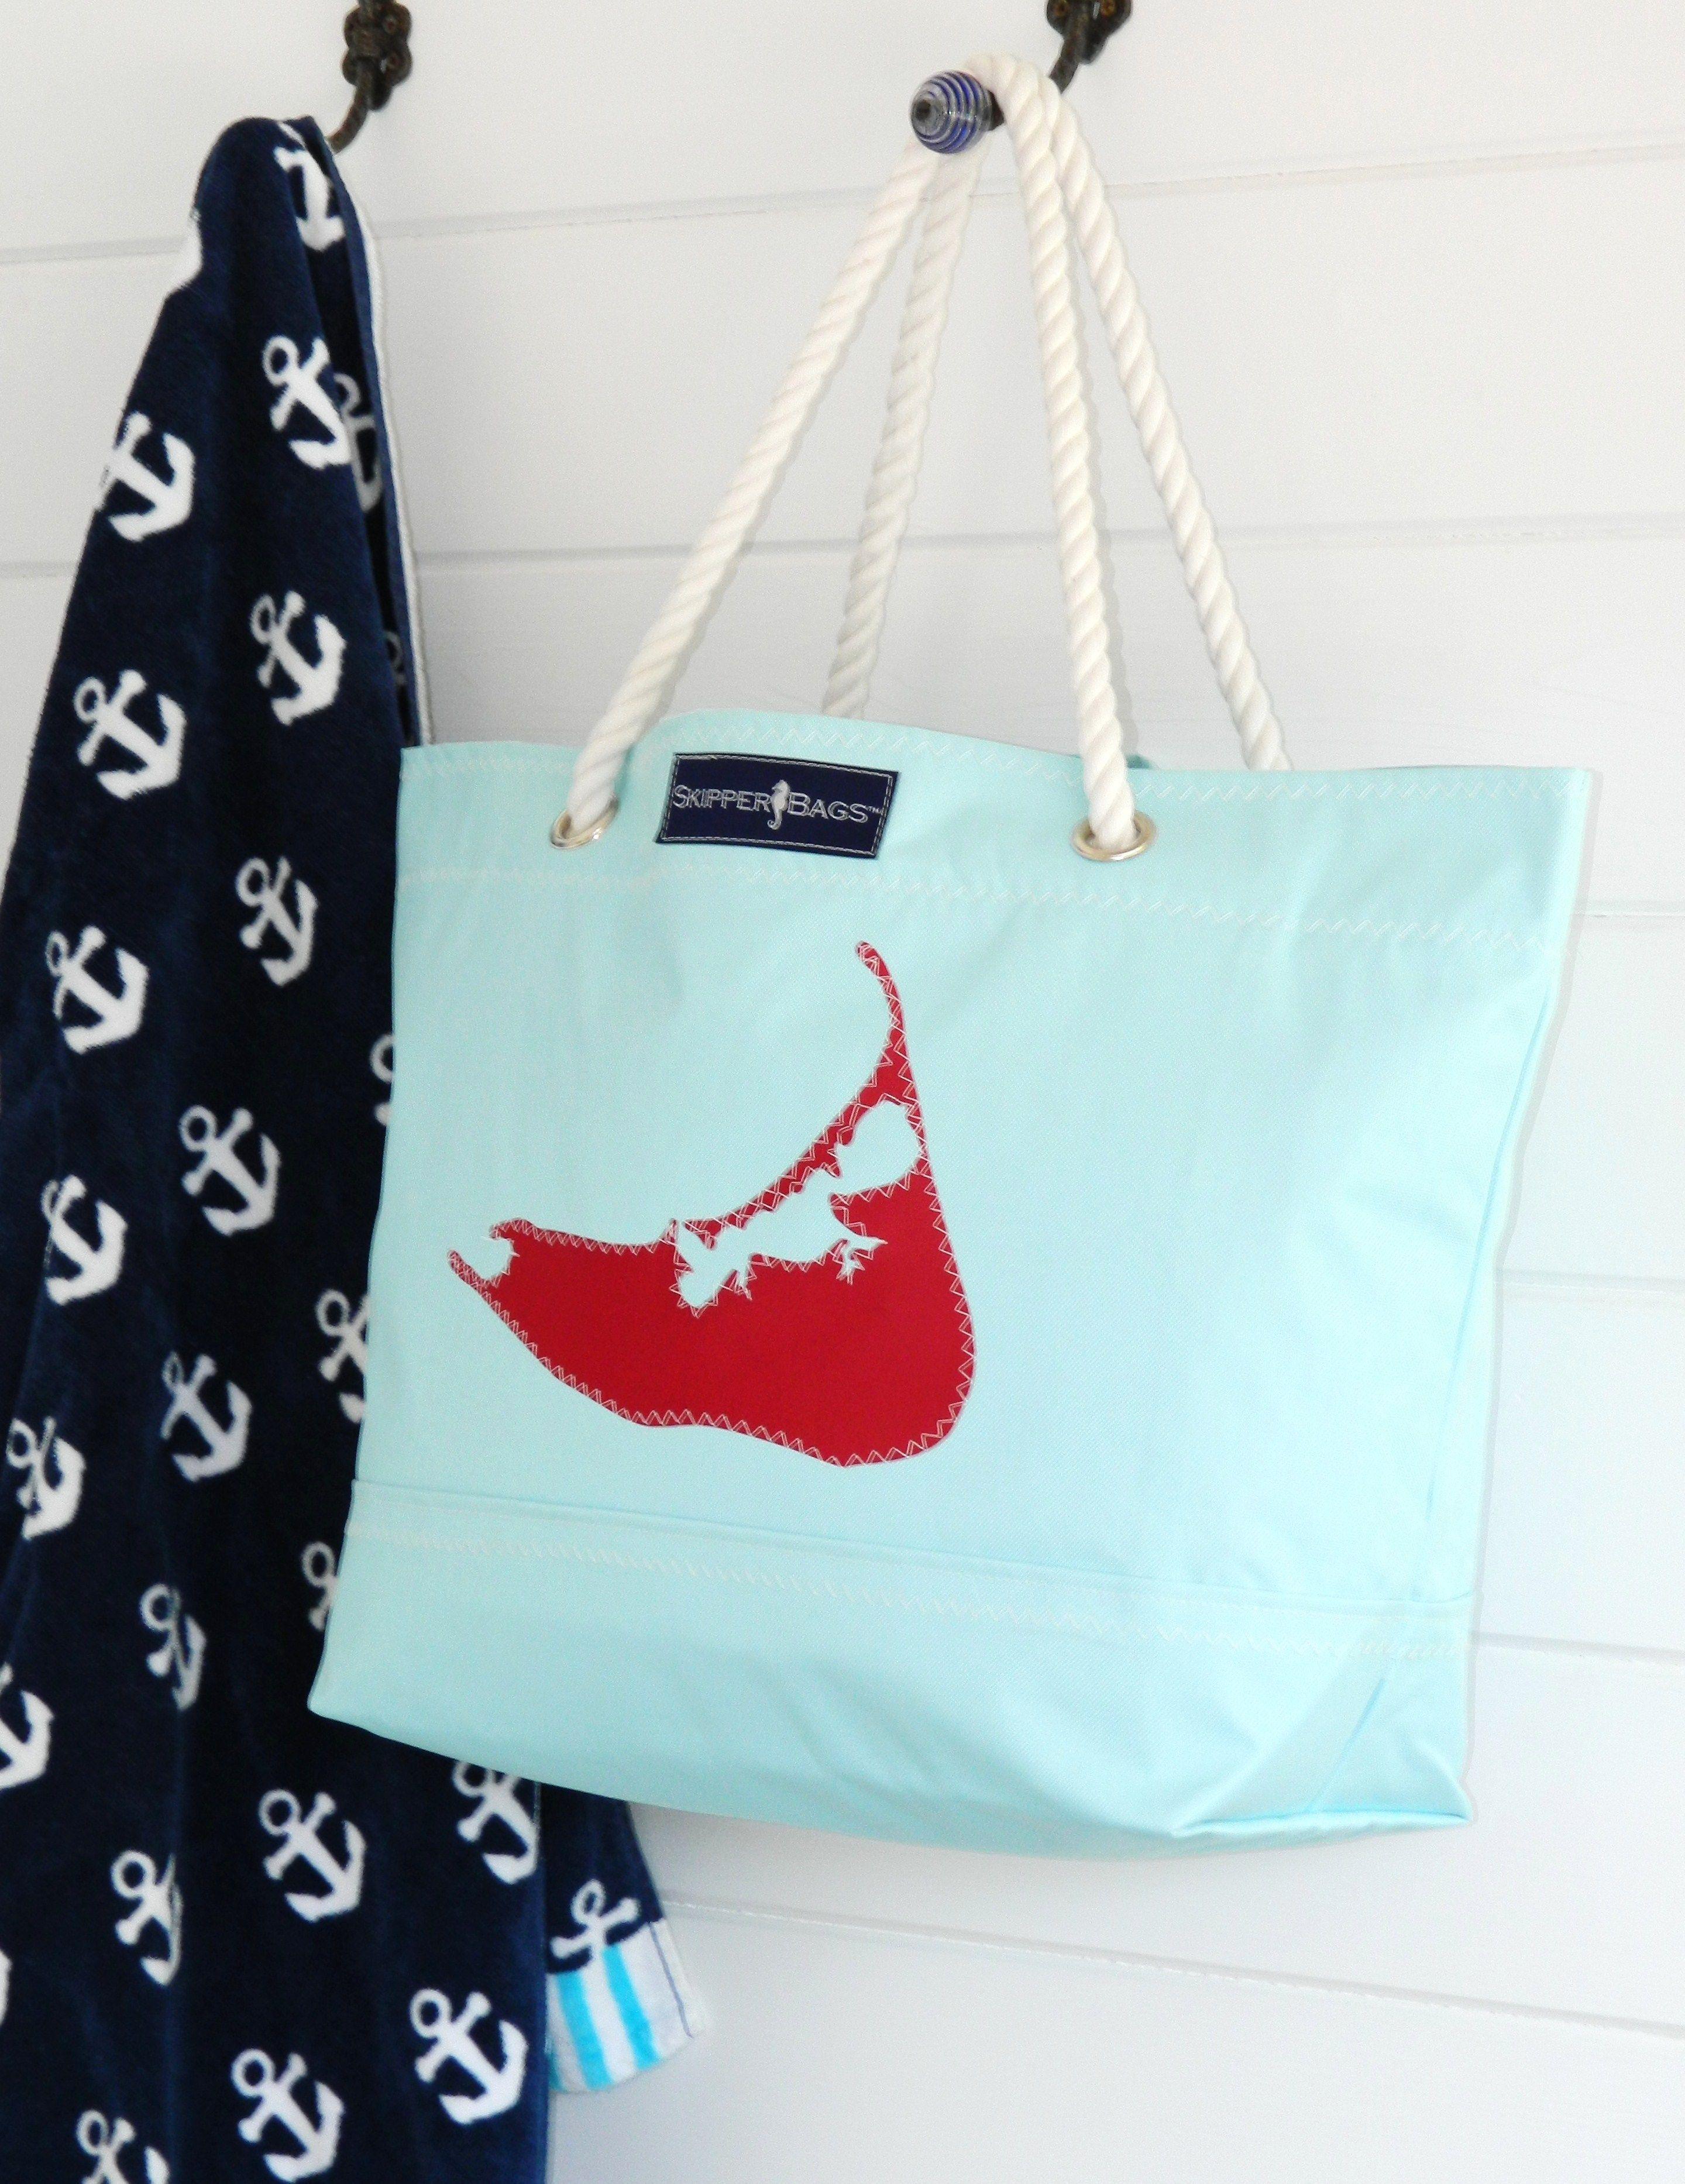 Nantucket Skipper Bag Www Skipperbags Bags